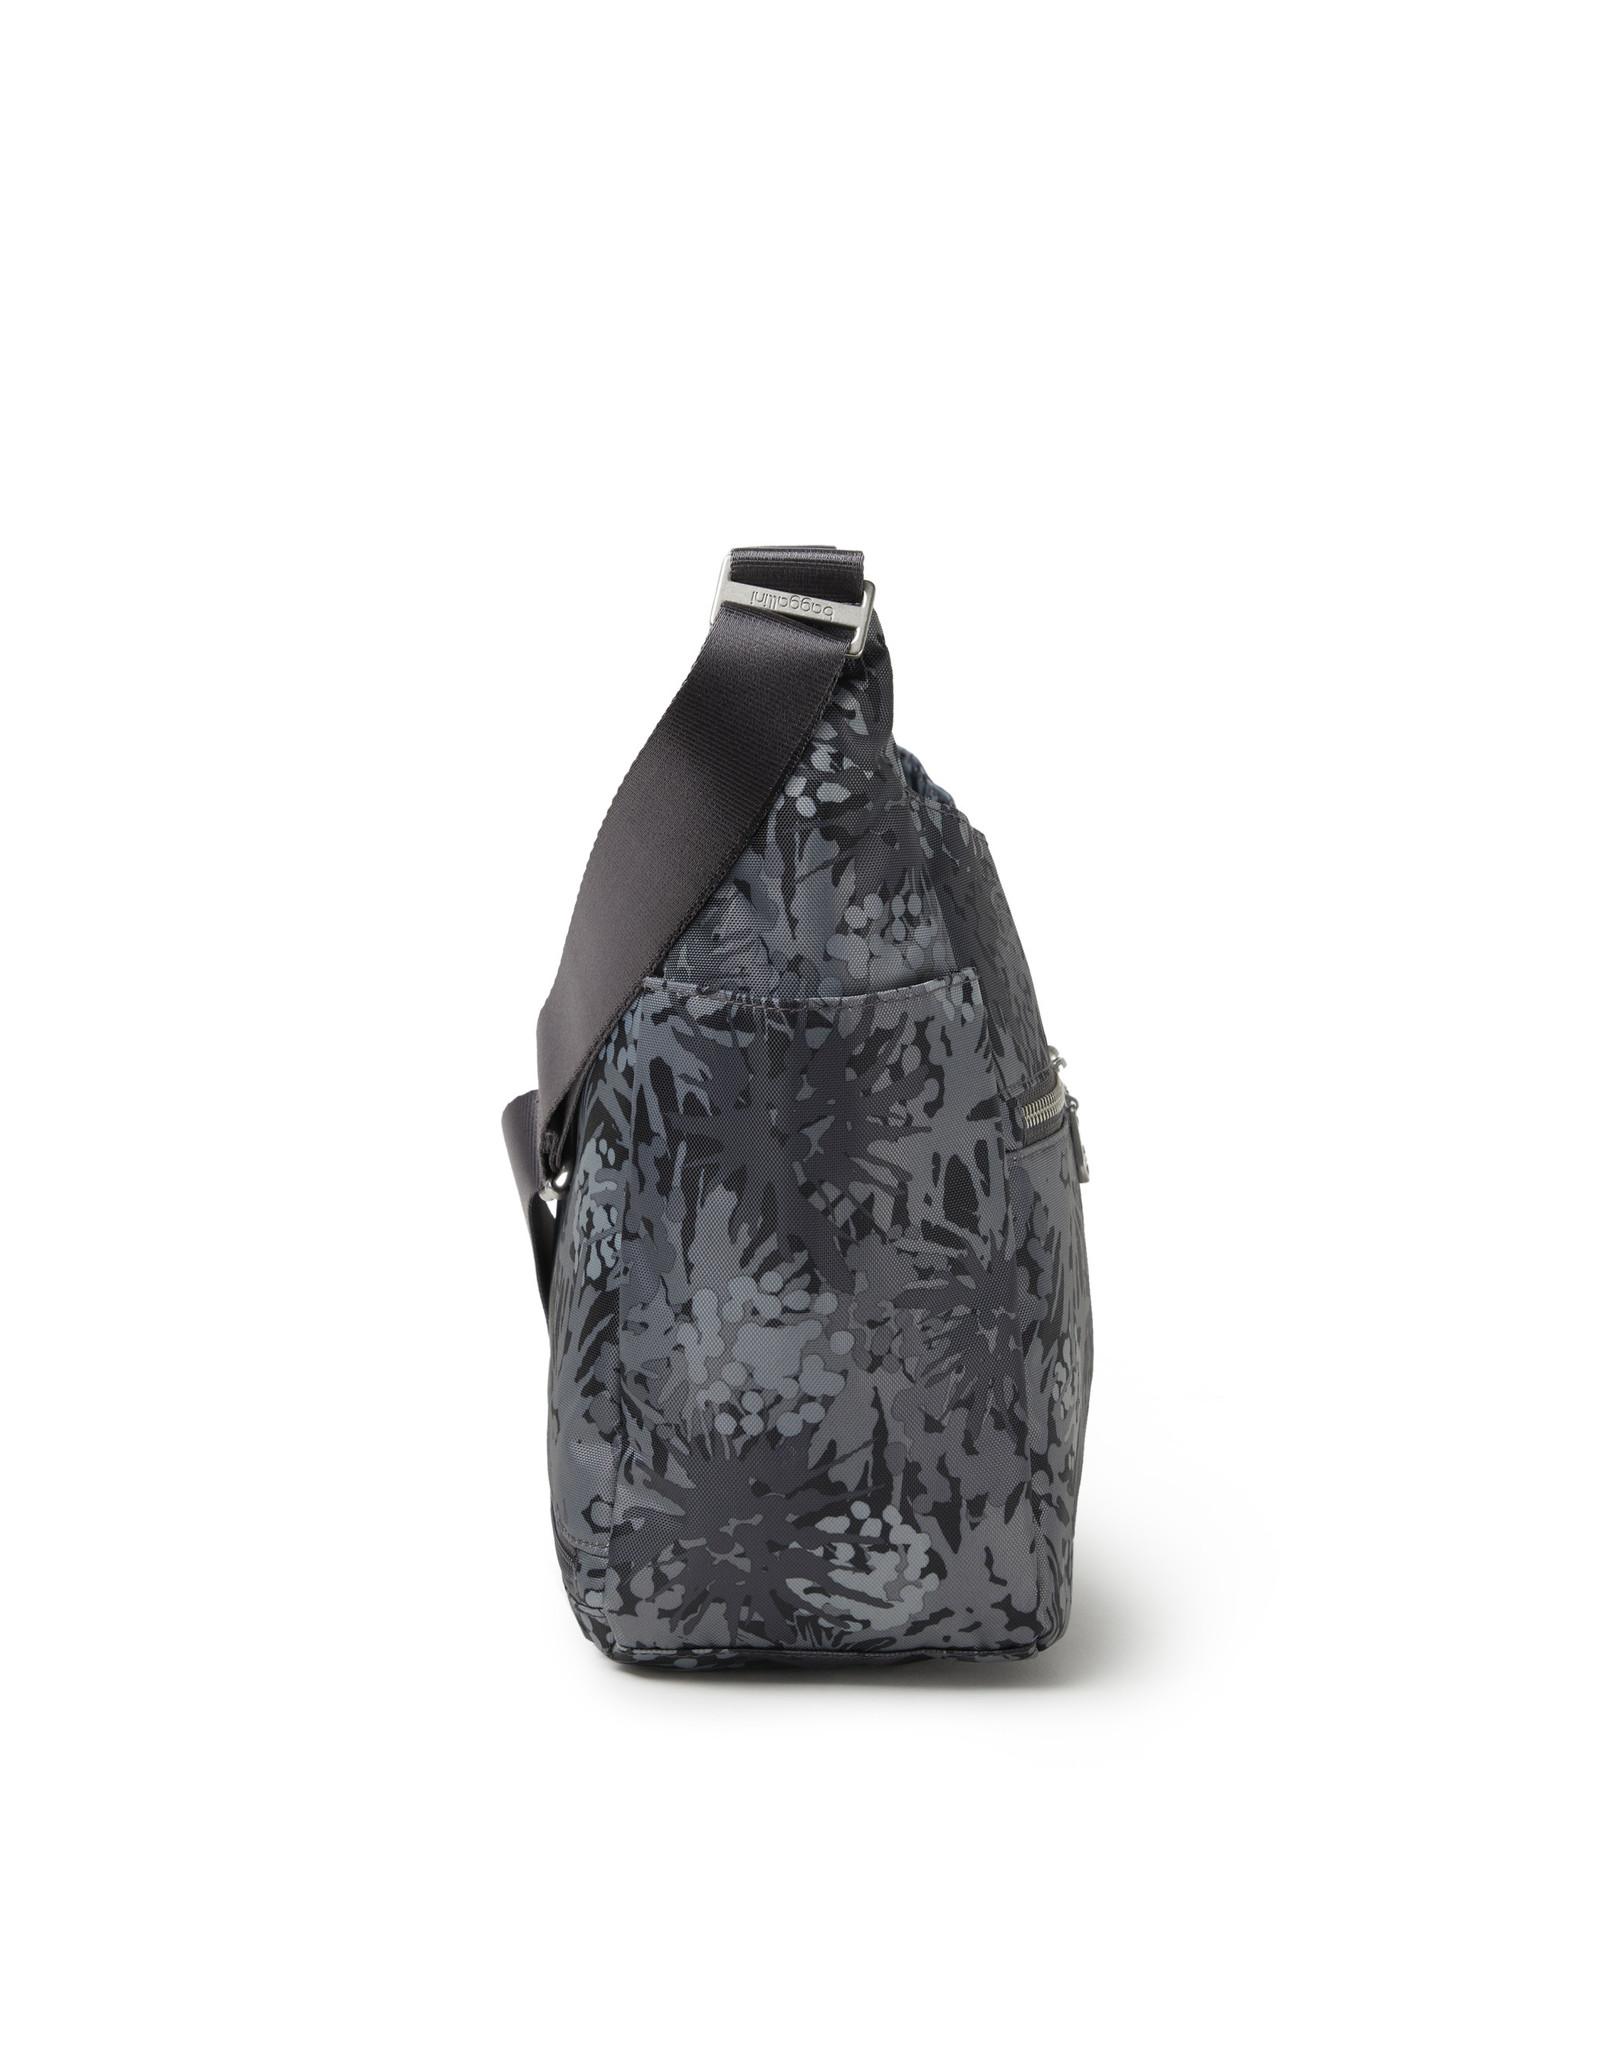 Baggallini Bristol RFID Crossbody Bag - Pewter Thistle